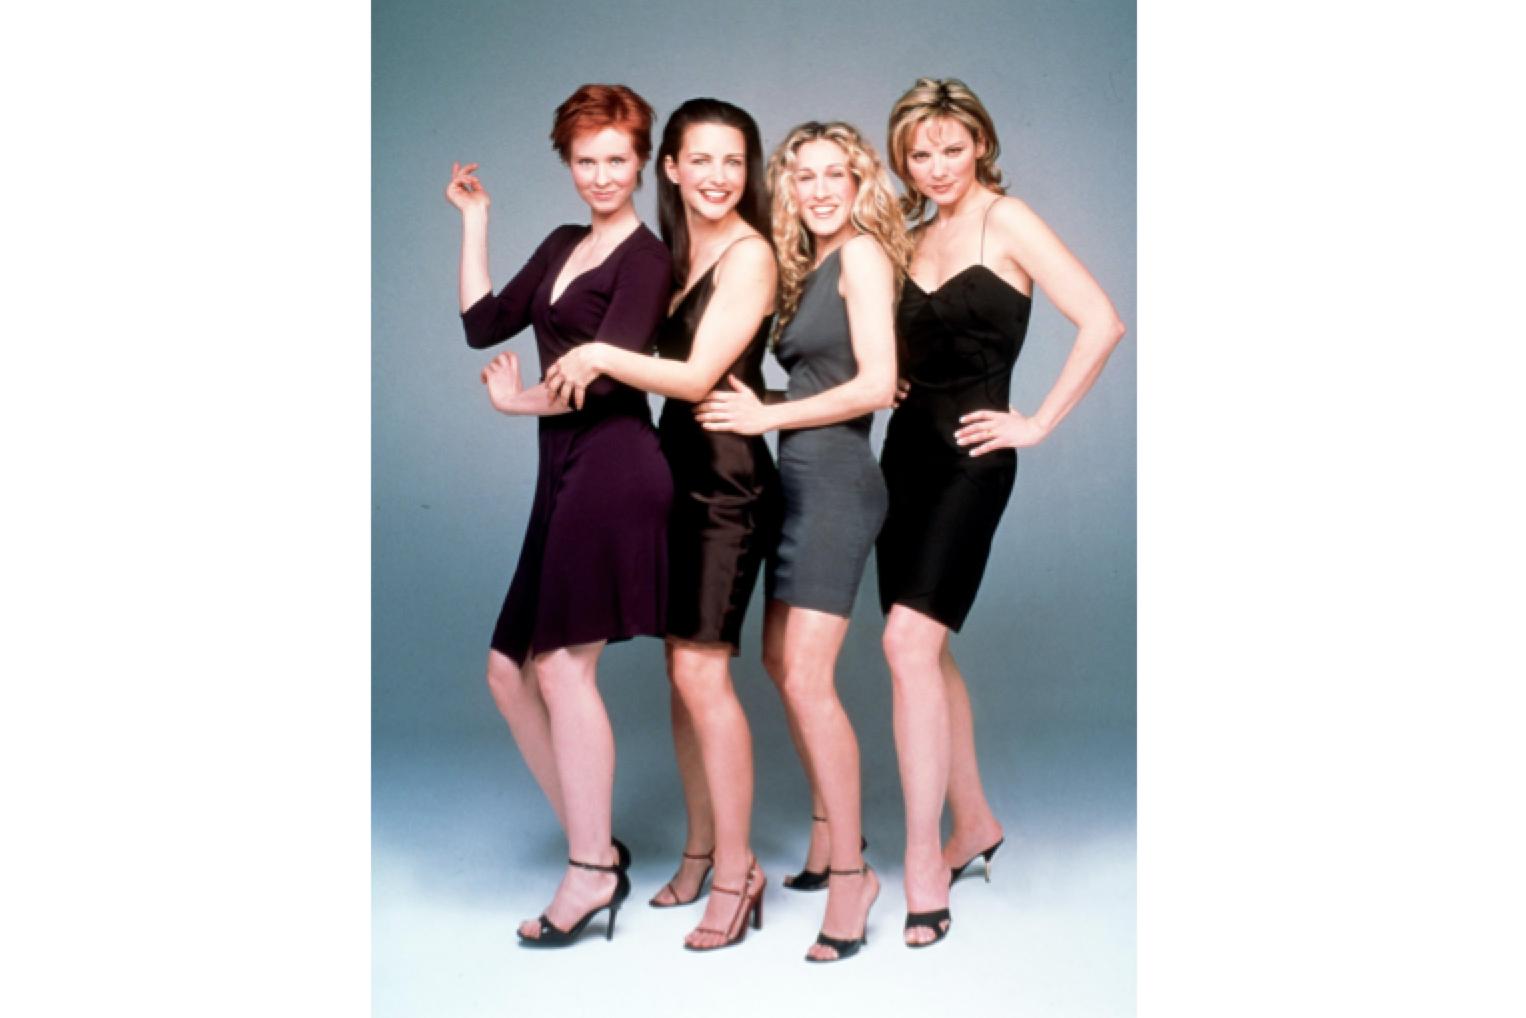 Cynthia Nixon, Kristin Davis, Sarah Jessica Parker and Kim Cattrall in 1999